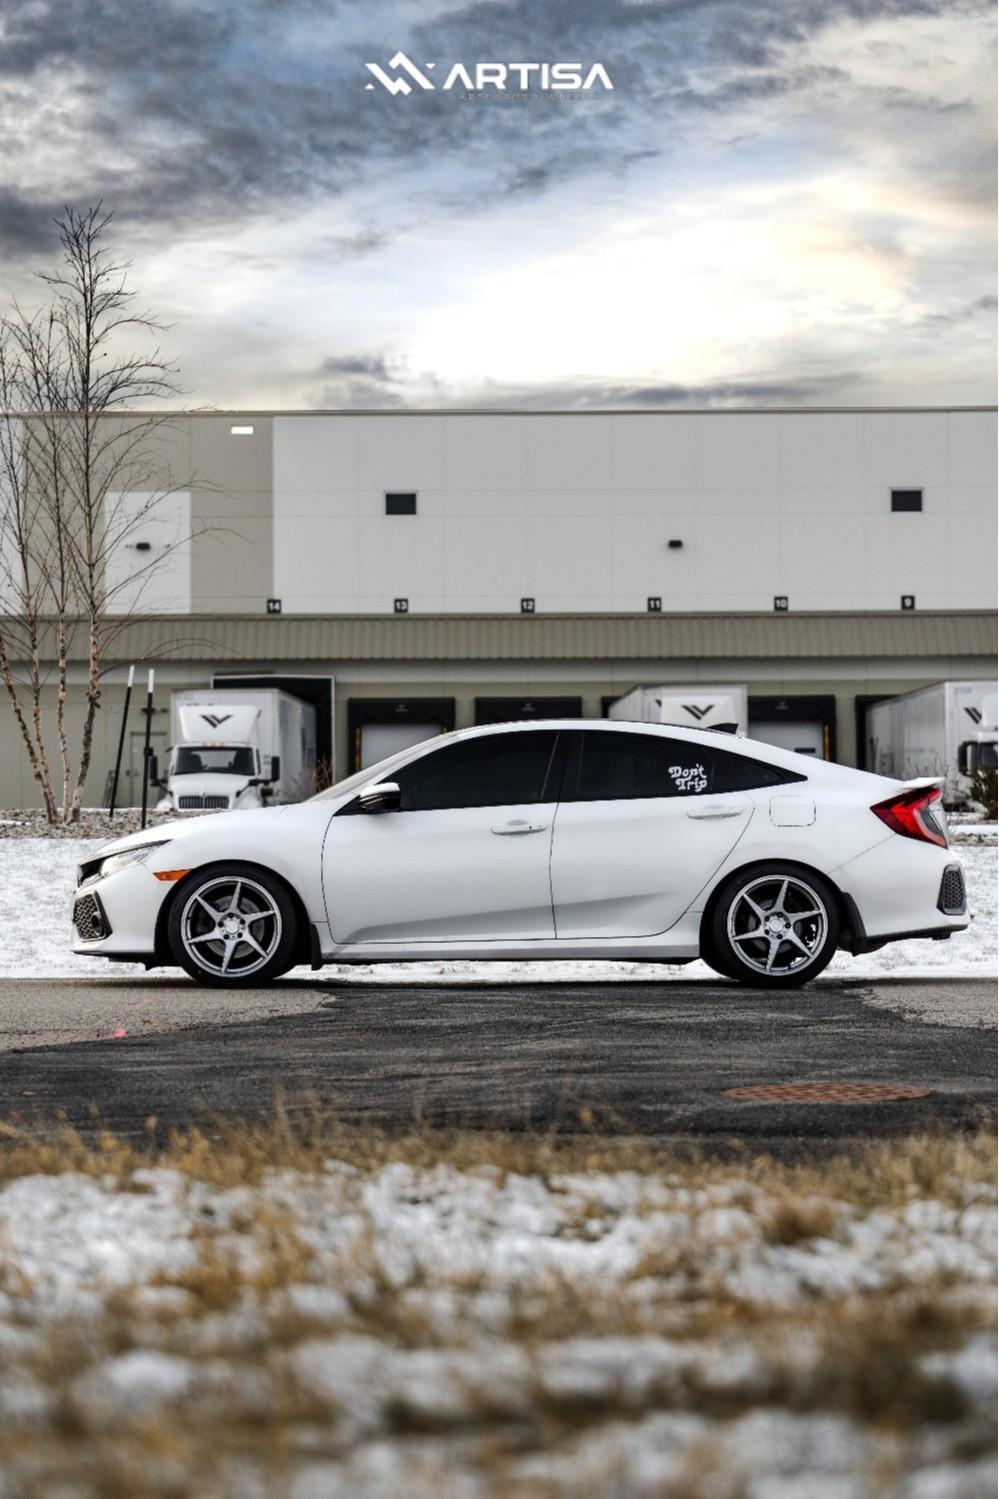 3 2018 Civic Honda Si Eibach Lowering Springs Artisa Artformed Titan Silver